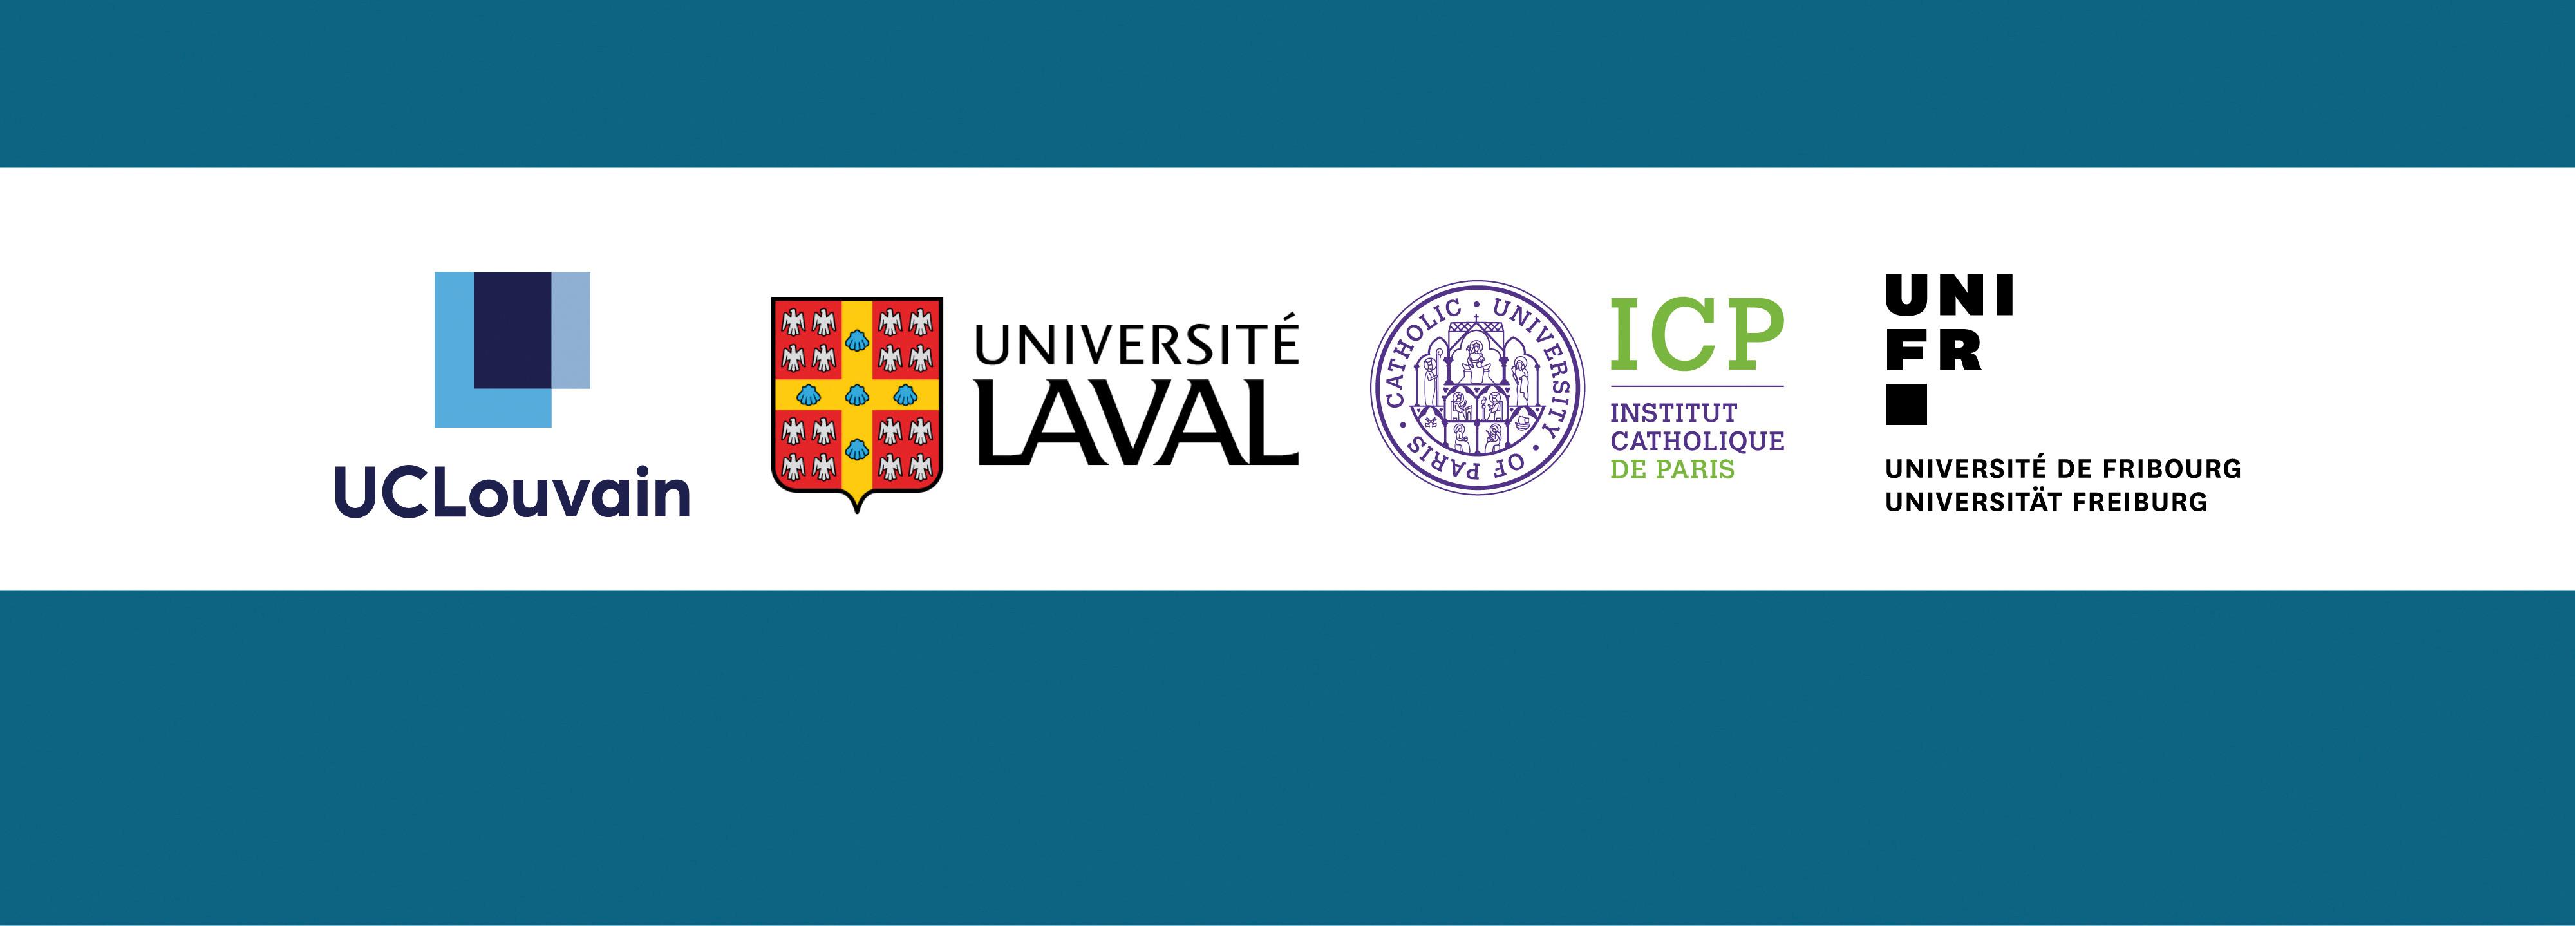 un partenariat entre l'UCL, l'UL, l'ICP et l'UniFR